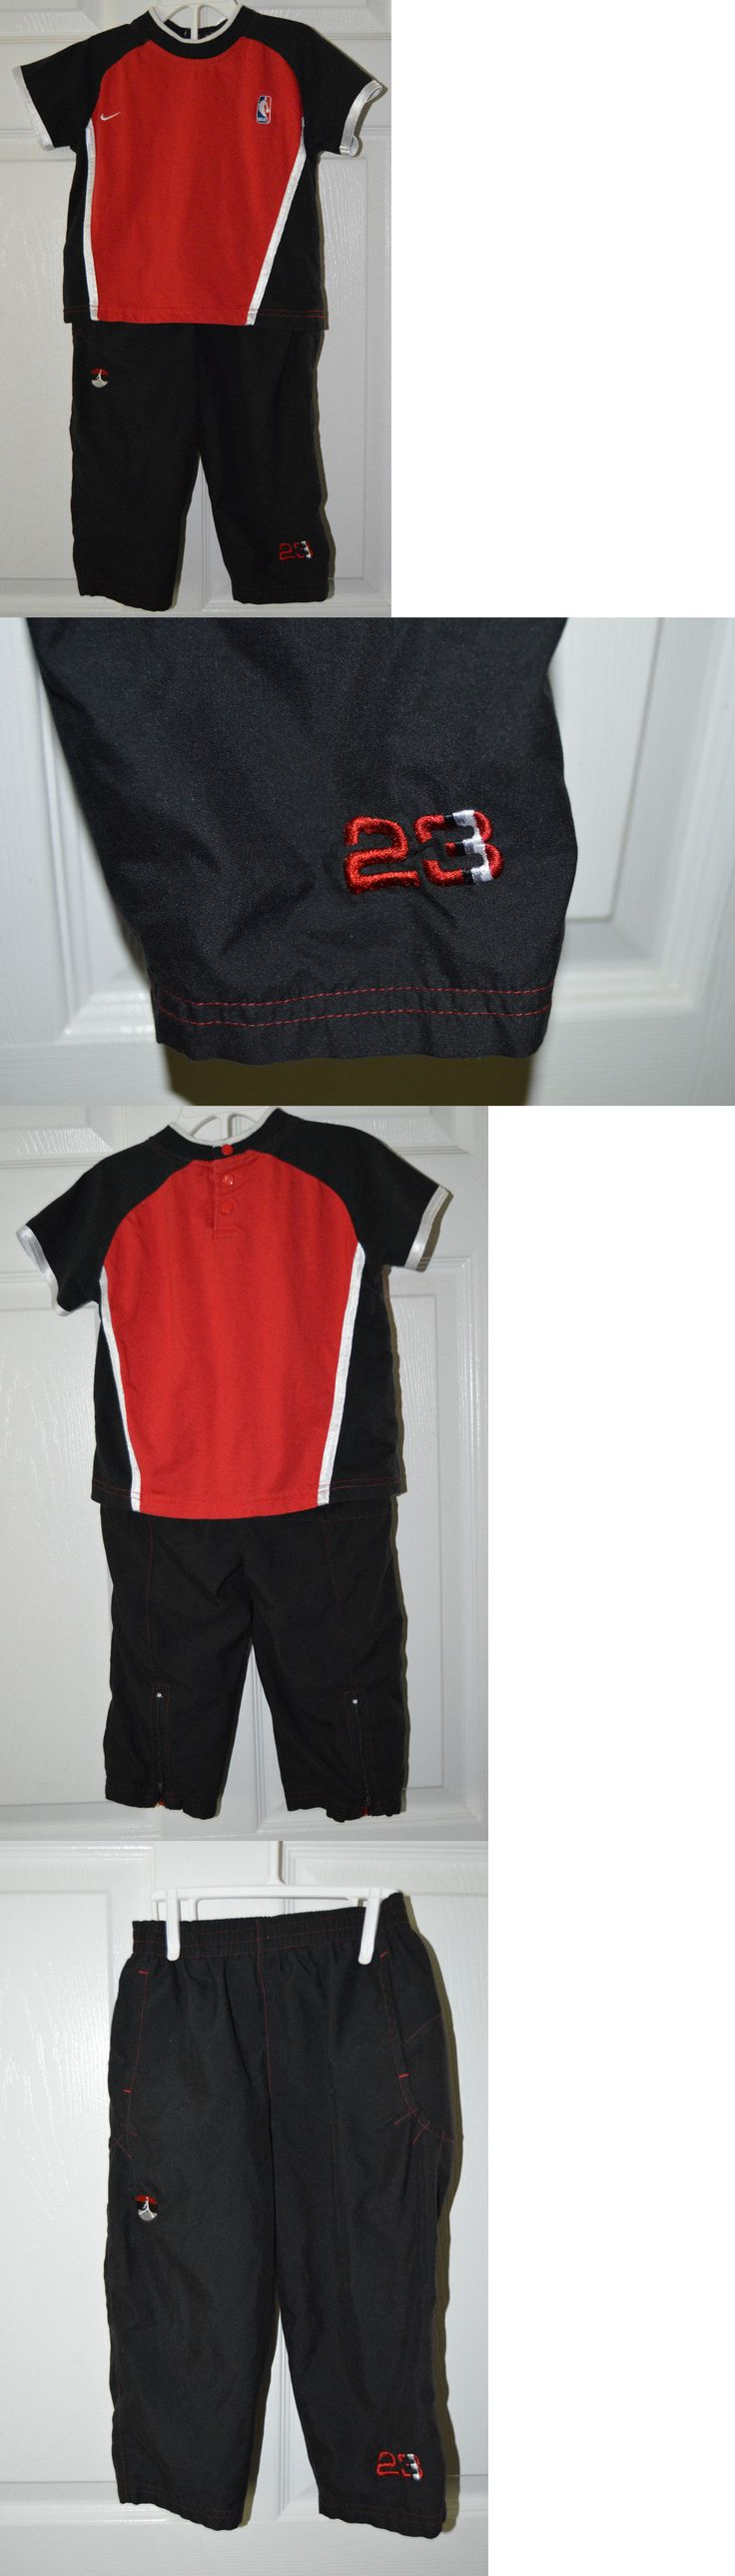 Michael Jordan Baby Clothing: Nike Nba Michael Jordan 2 Piece Boys Outfit 2T Red Shirt Black Pant 23 BUY IT NOW ONLY: $12.99